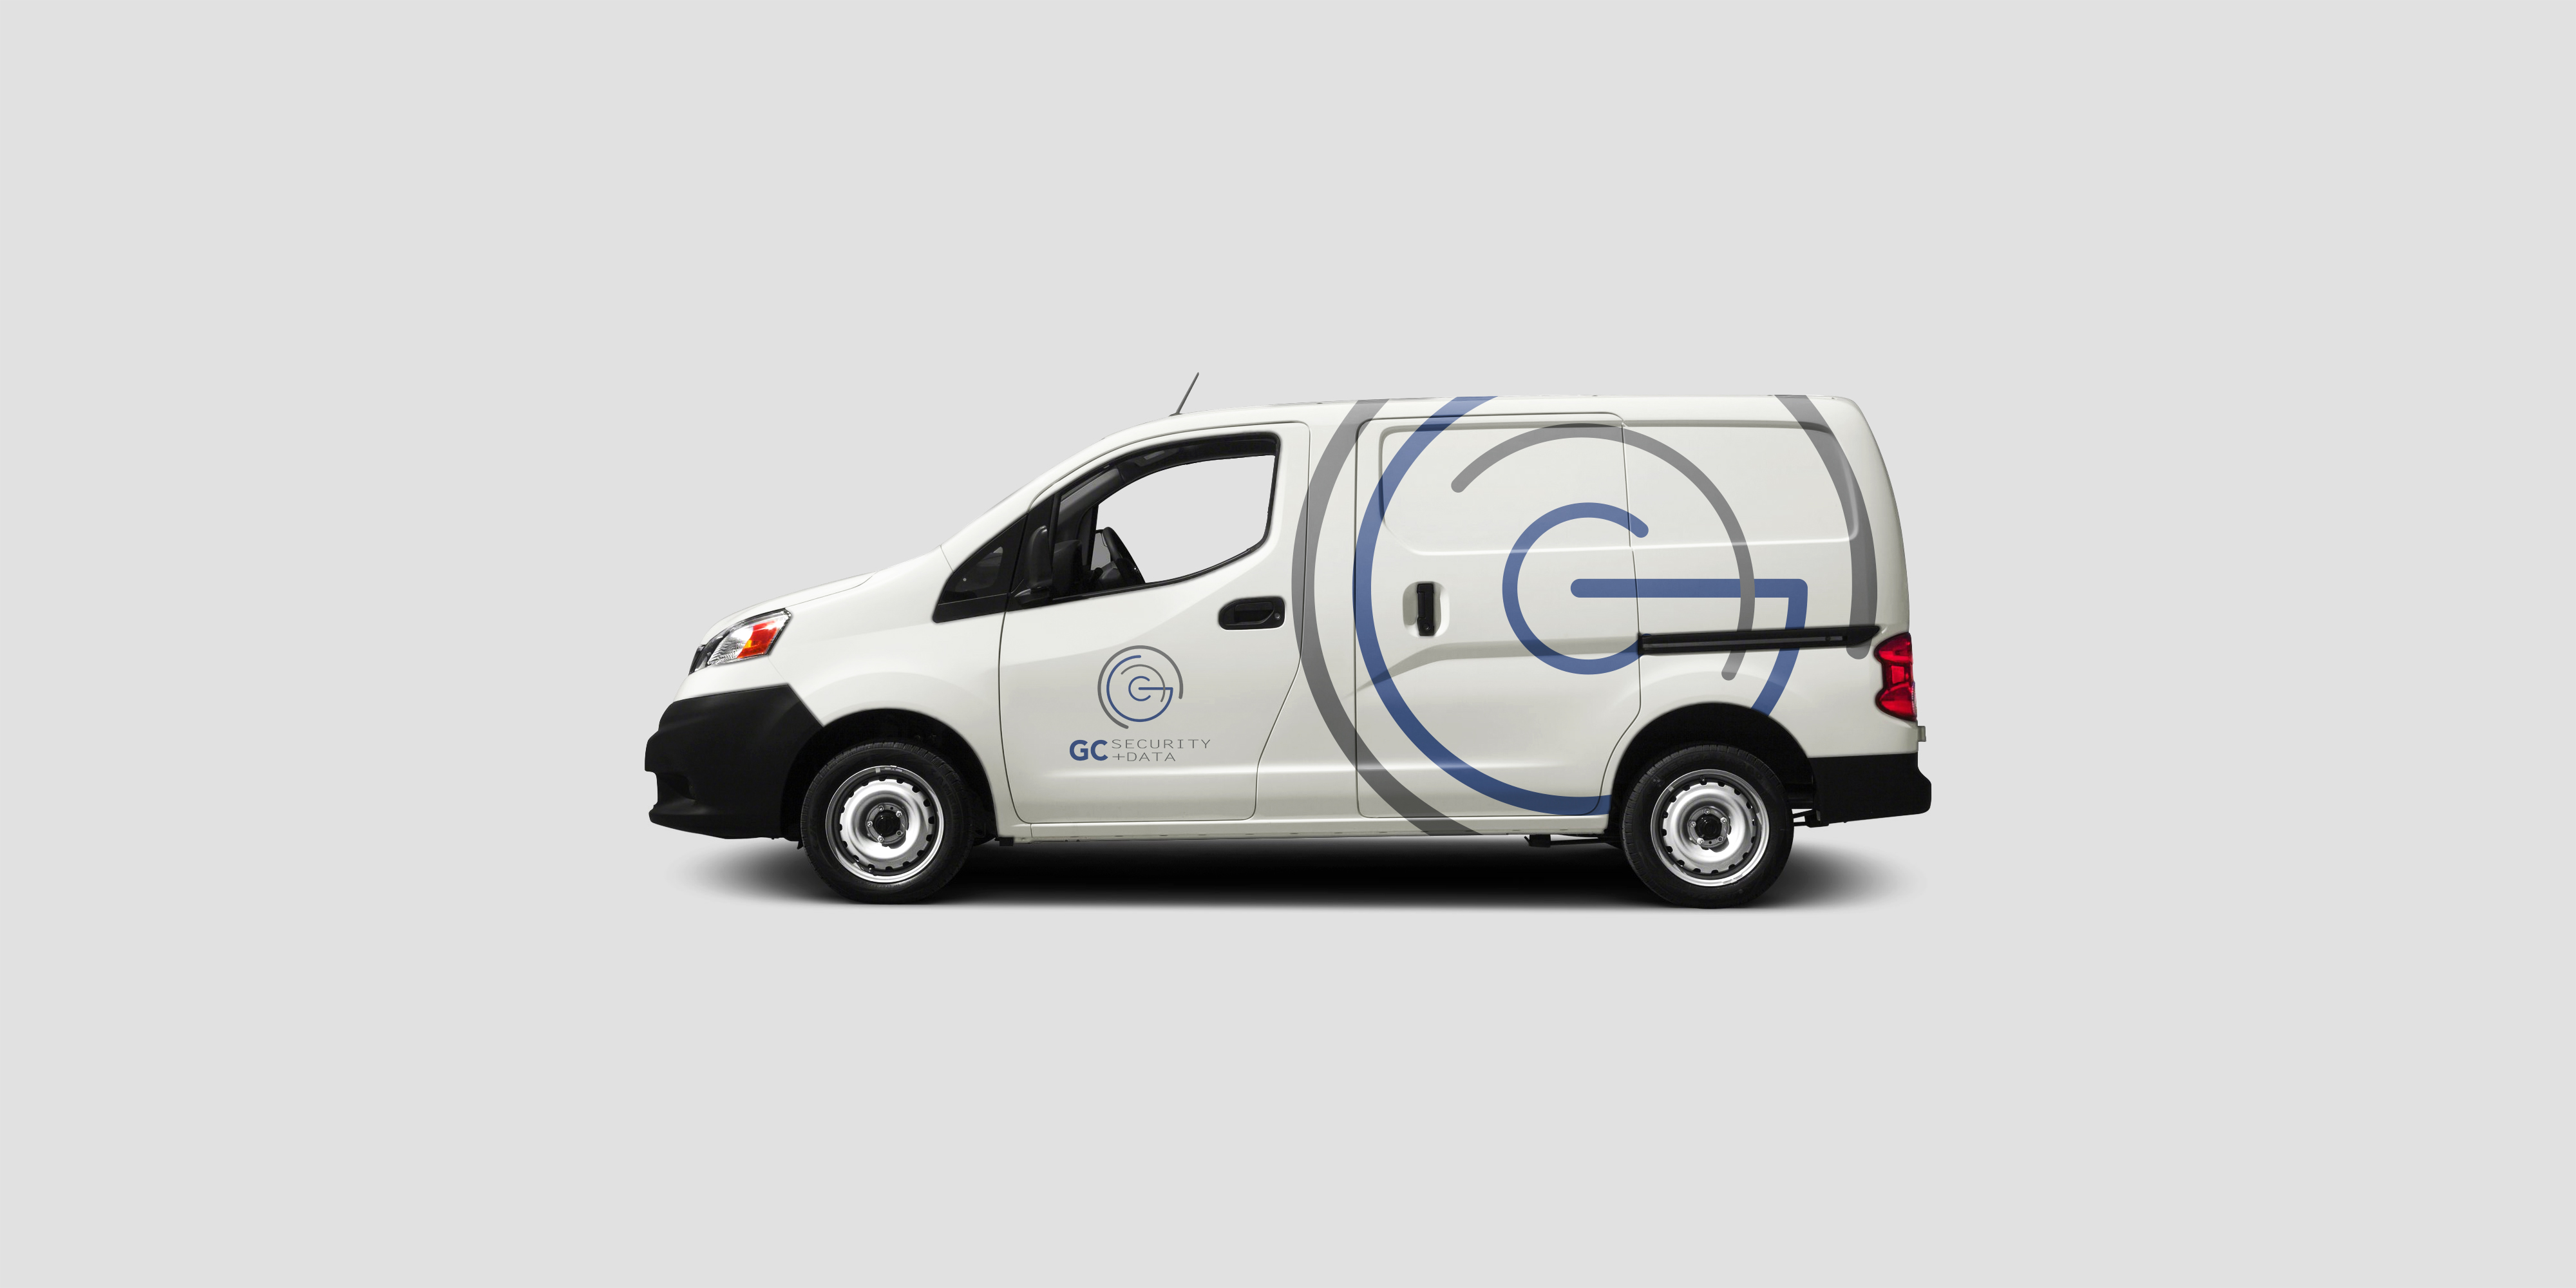 GC Electrical & Data